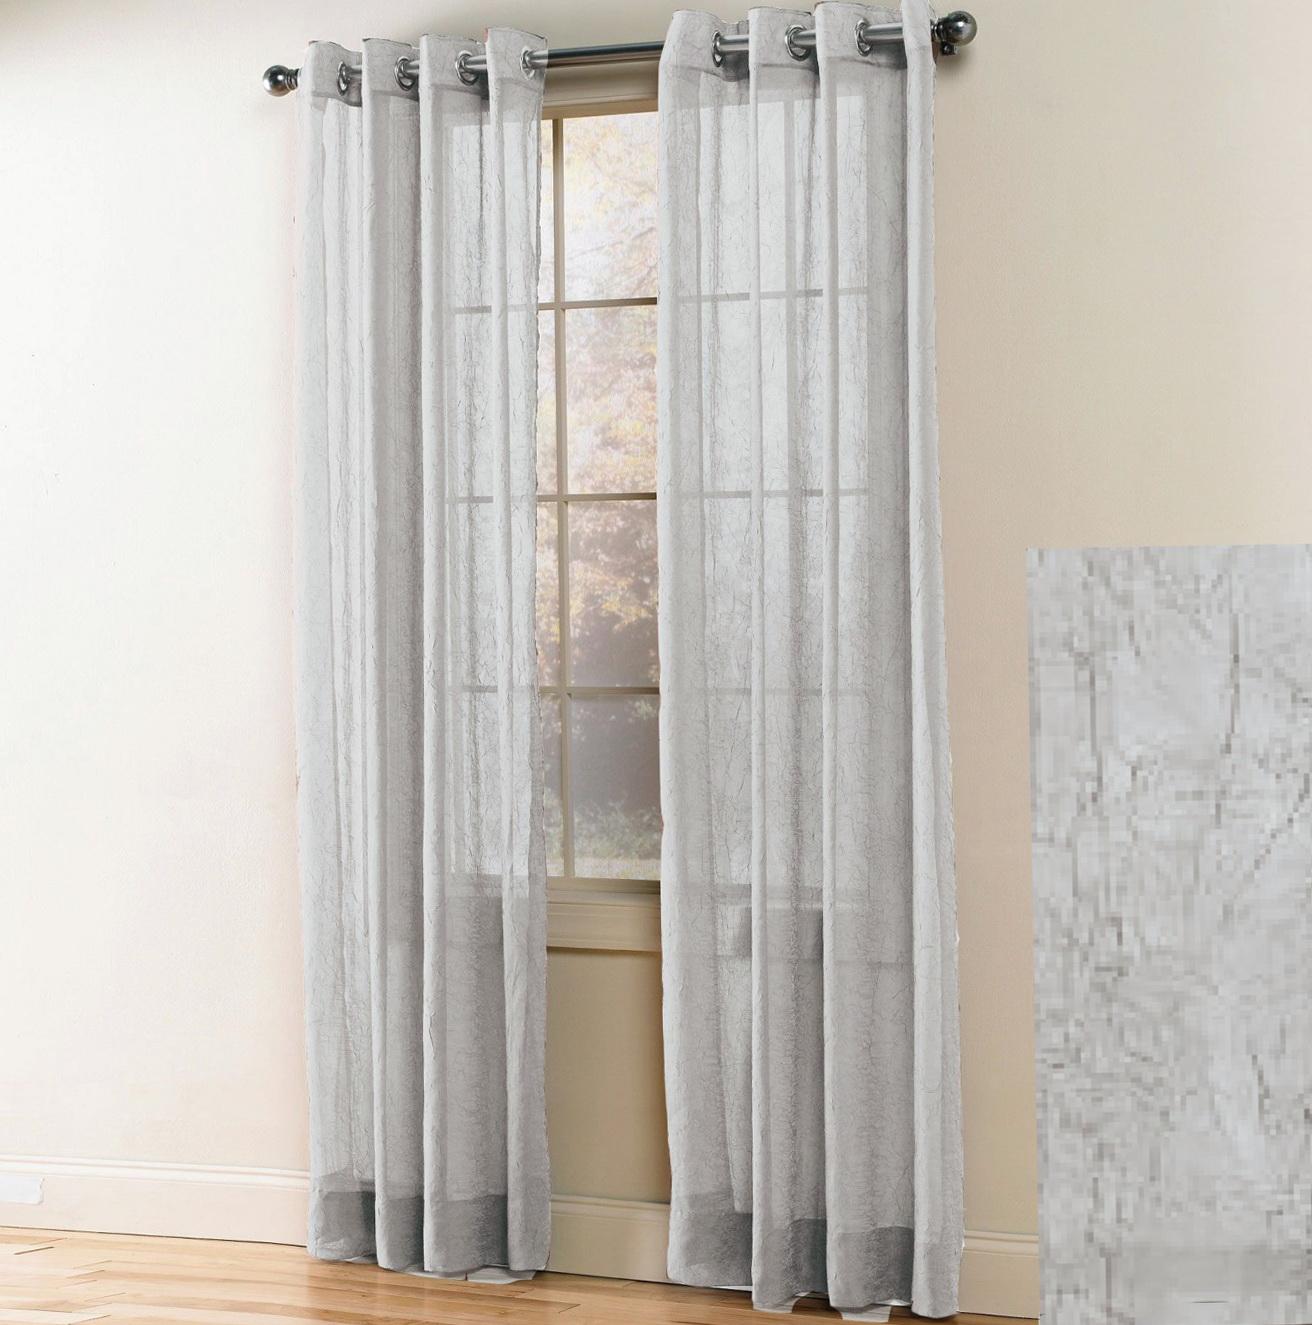 White Sheer Grommet Curtains Home Design Ideas